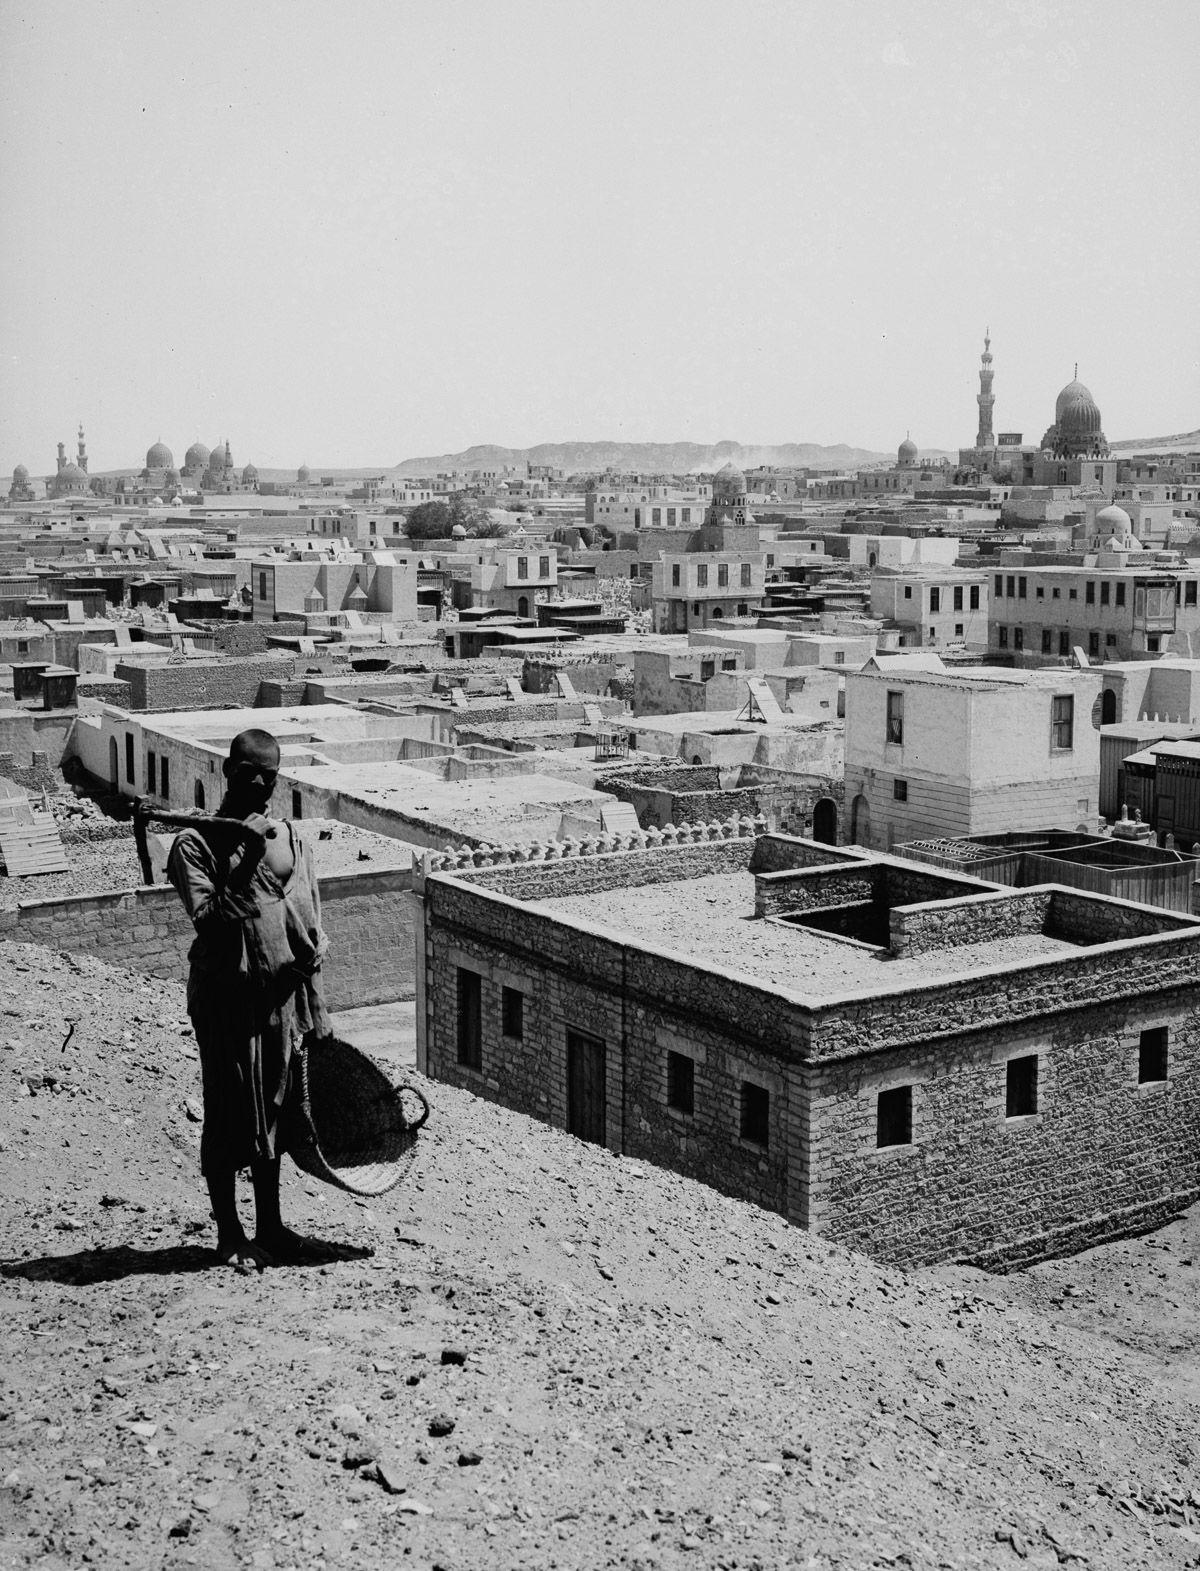 Istoricheskie fotografii Kaira 20